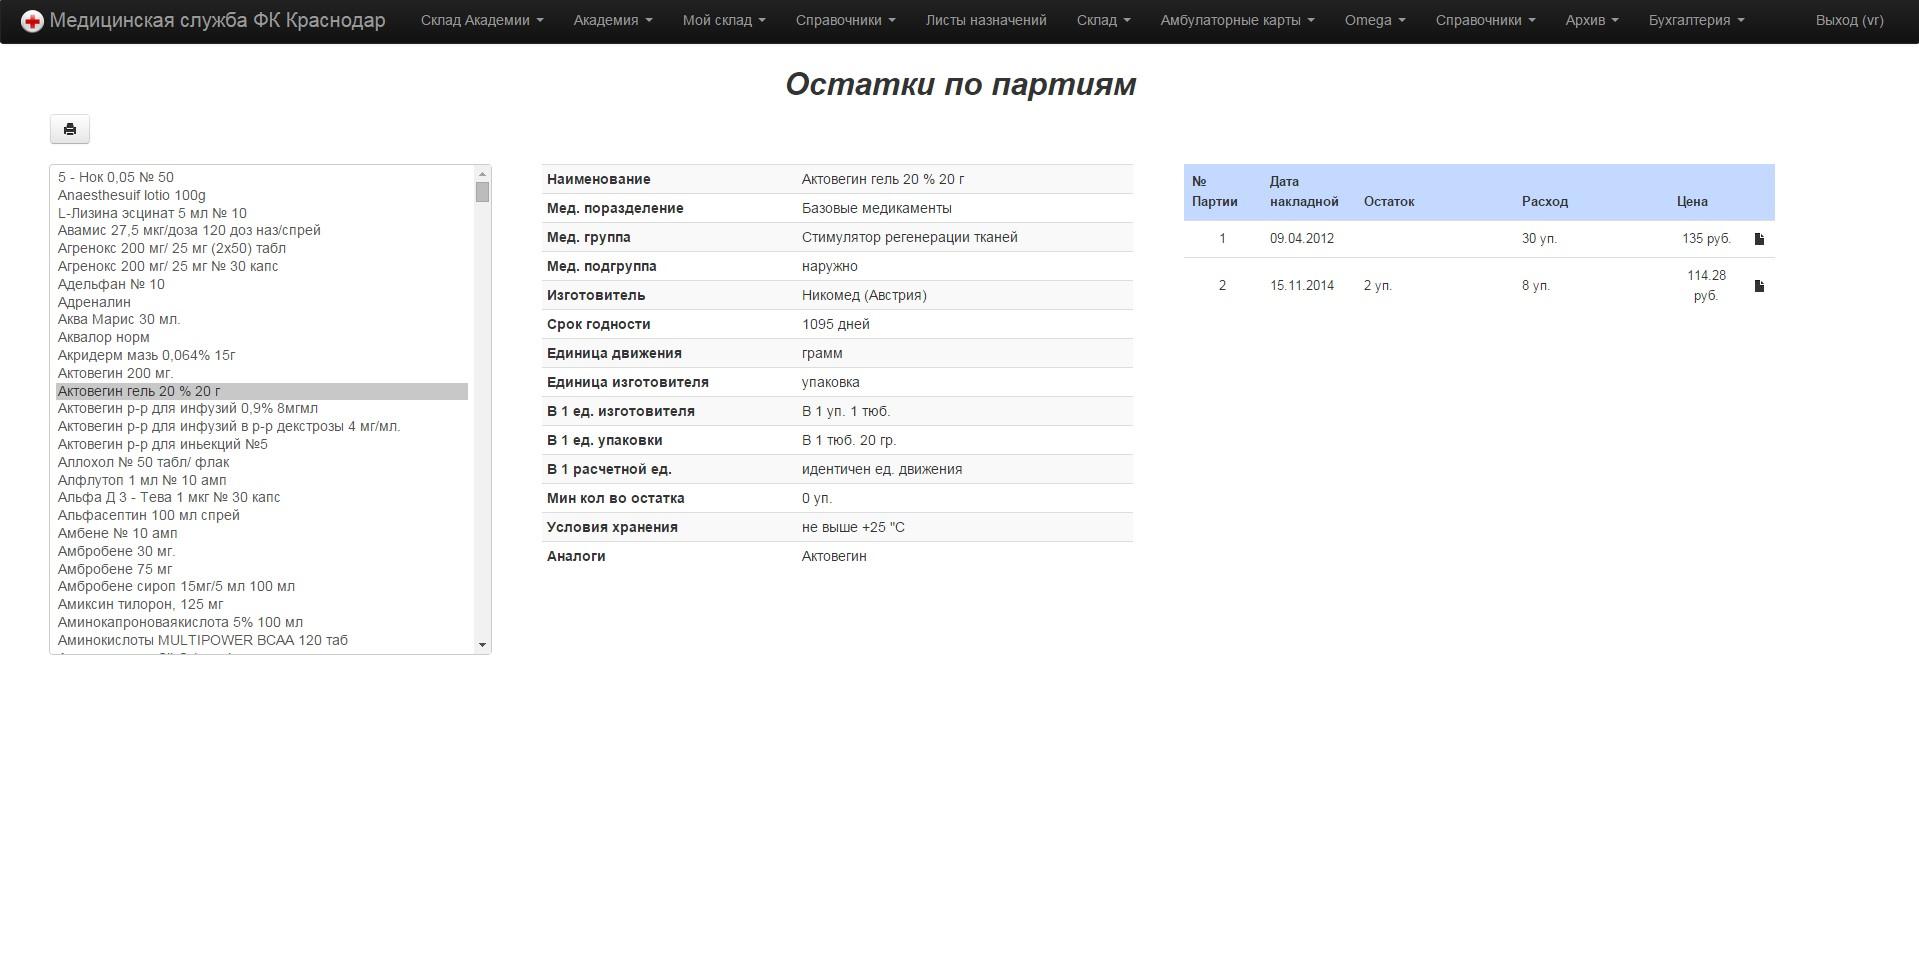 Ryzhak Vladimir - FC Krasnodar medicine application